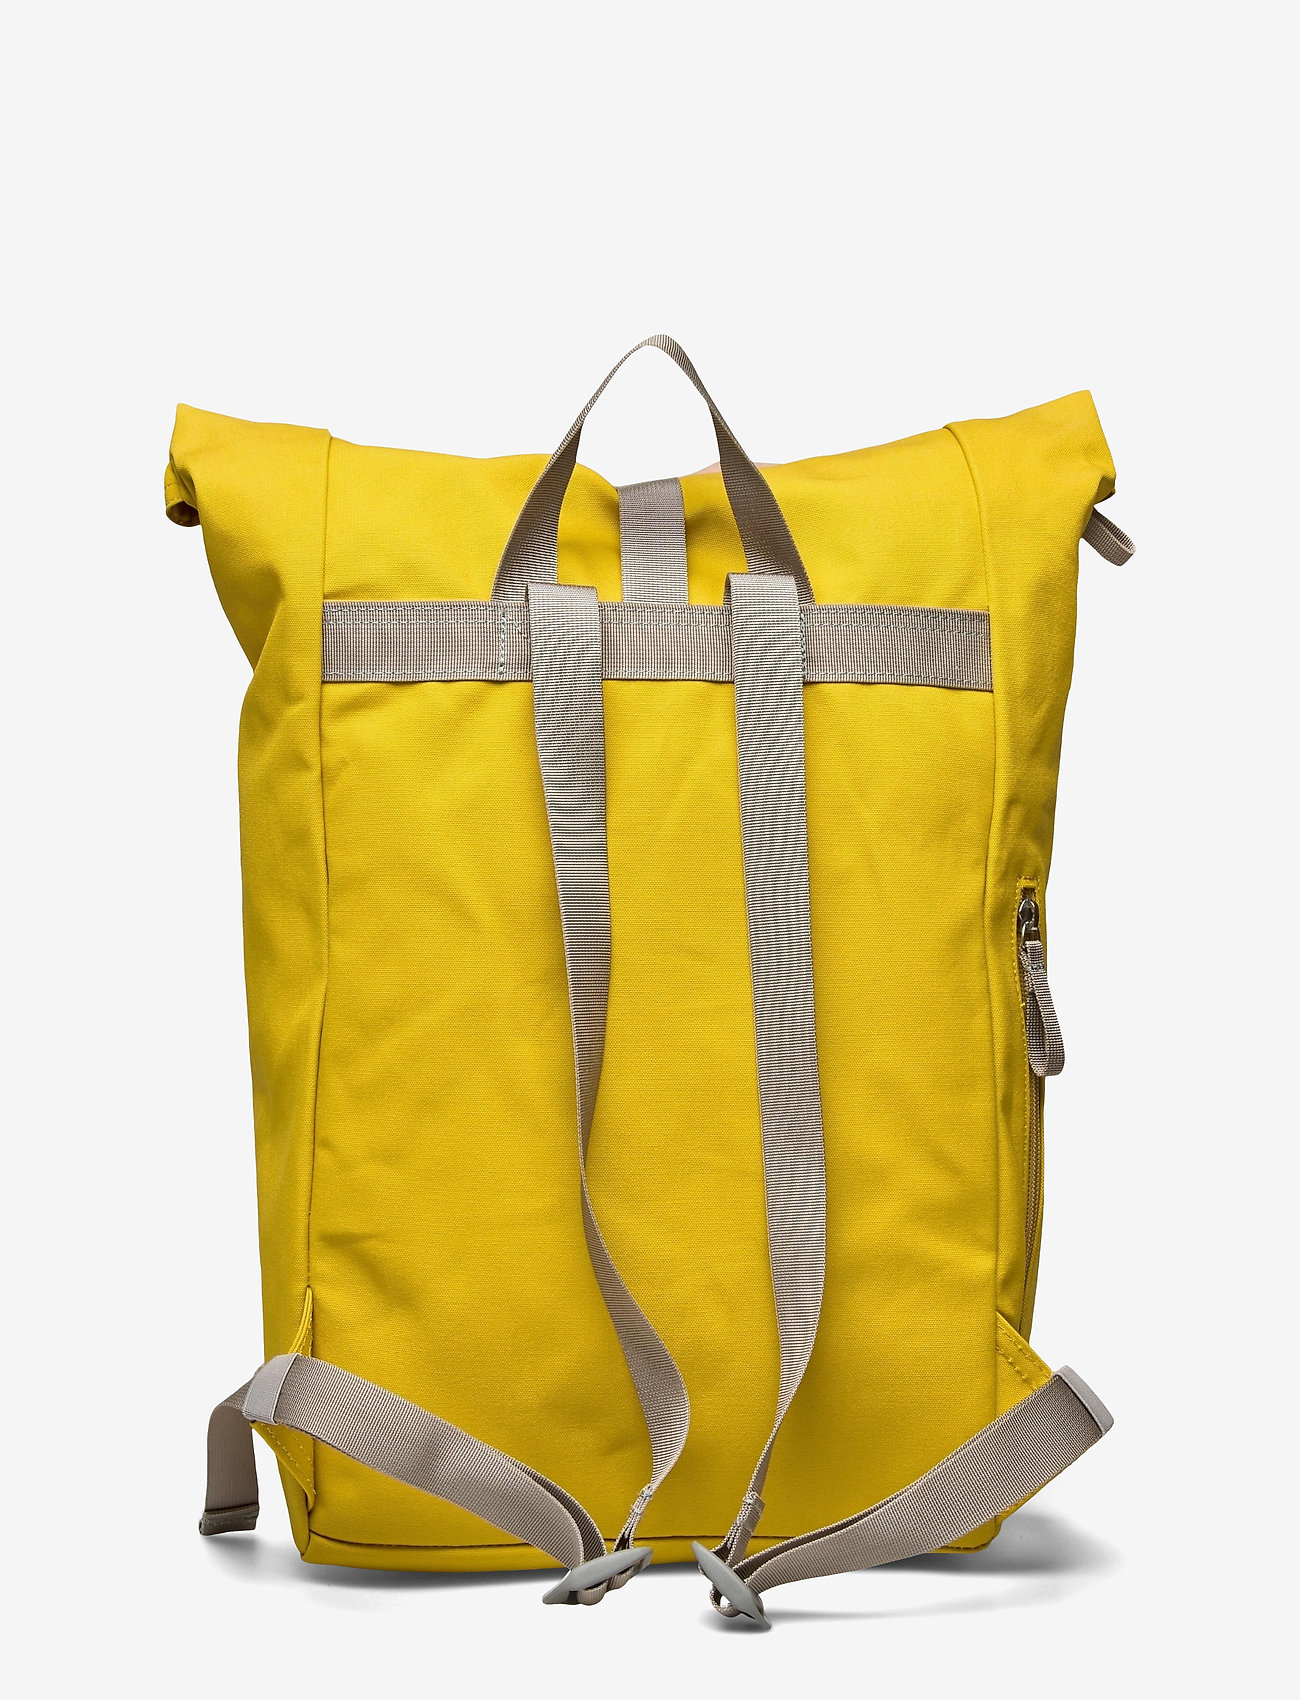 SANDQVIST - KAJ - bags - yellow with grey webbing - 1